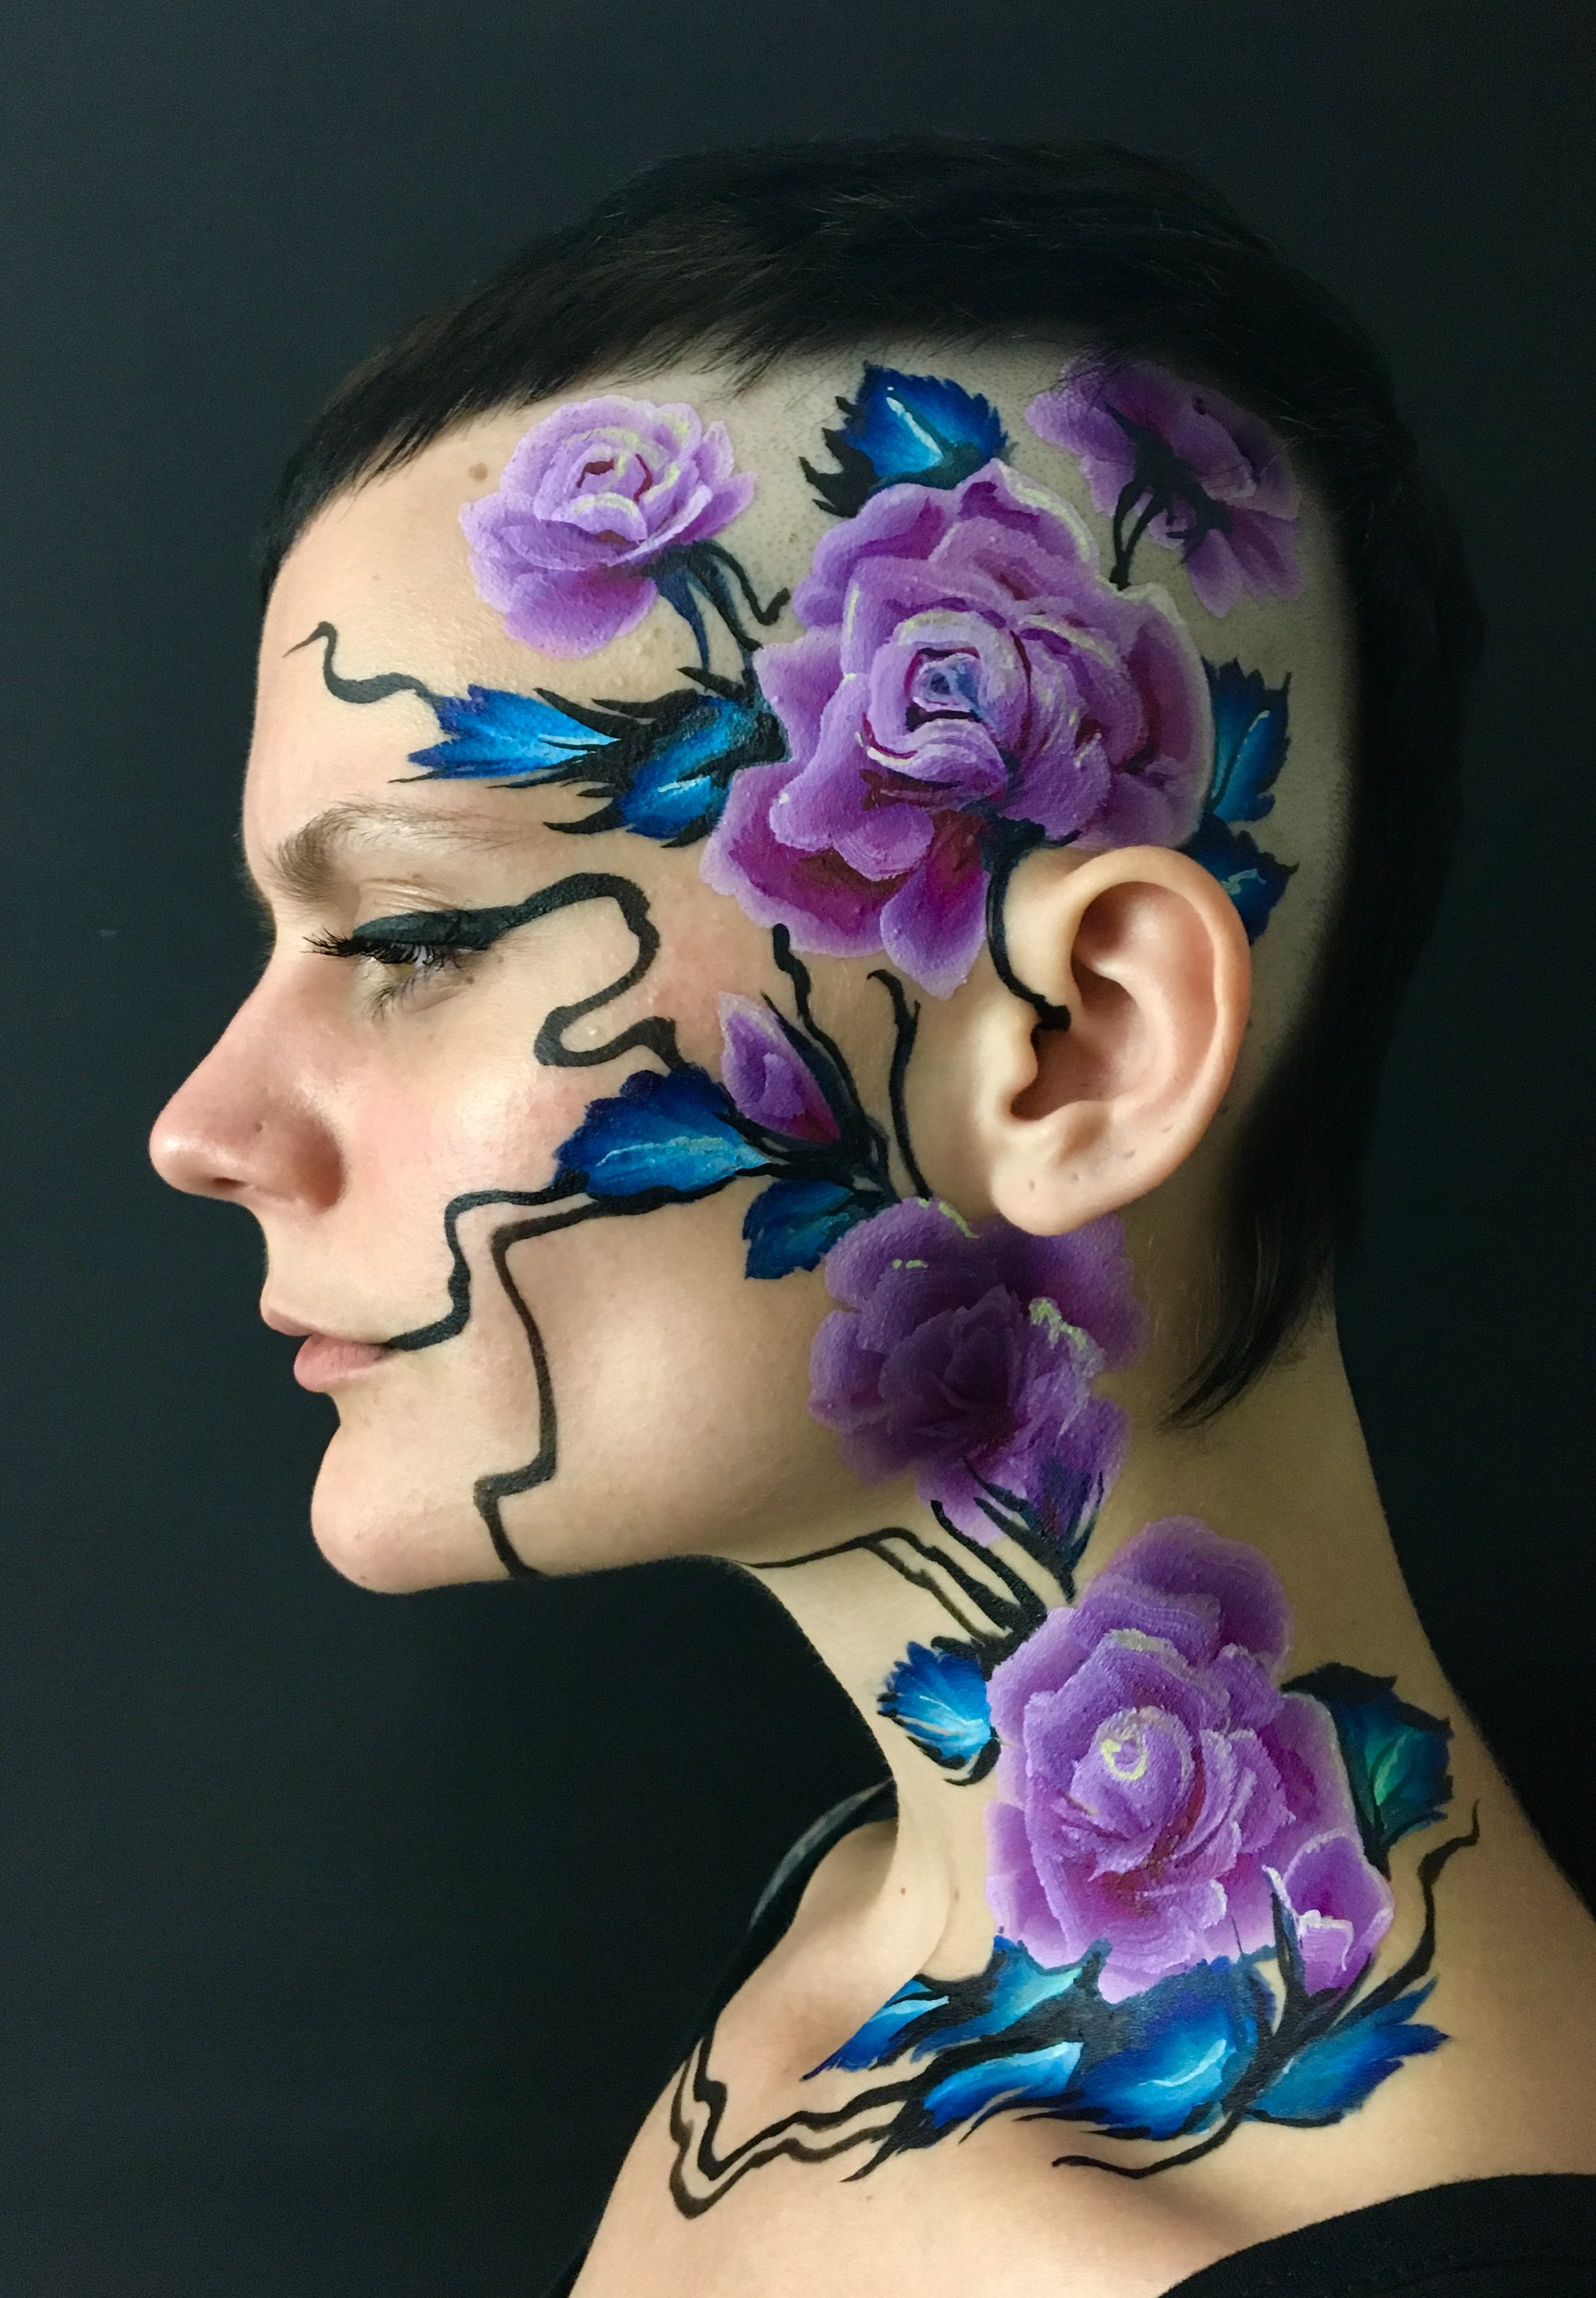 Purple floral mohawk face art - Brierley Thorpe 2018.jpg